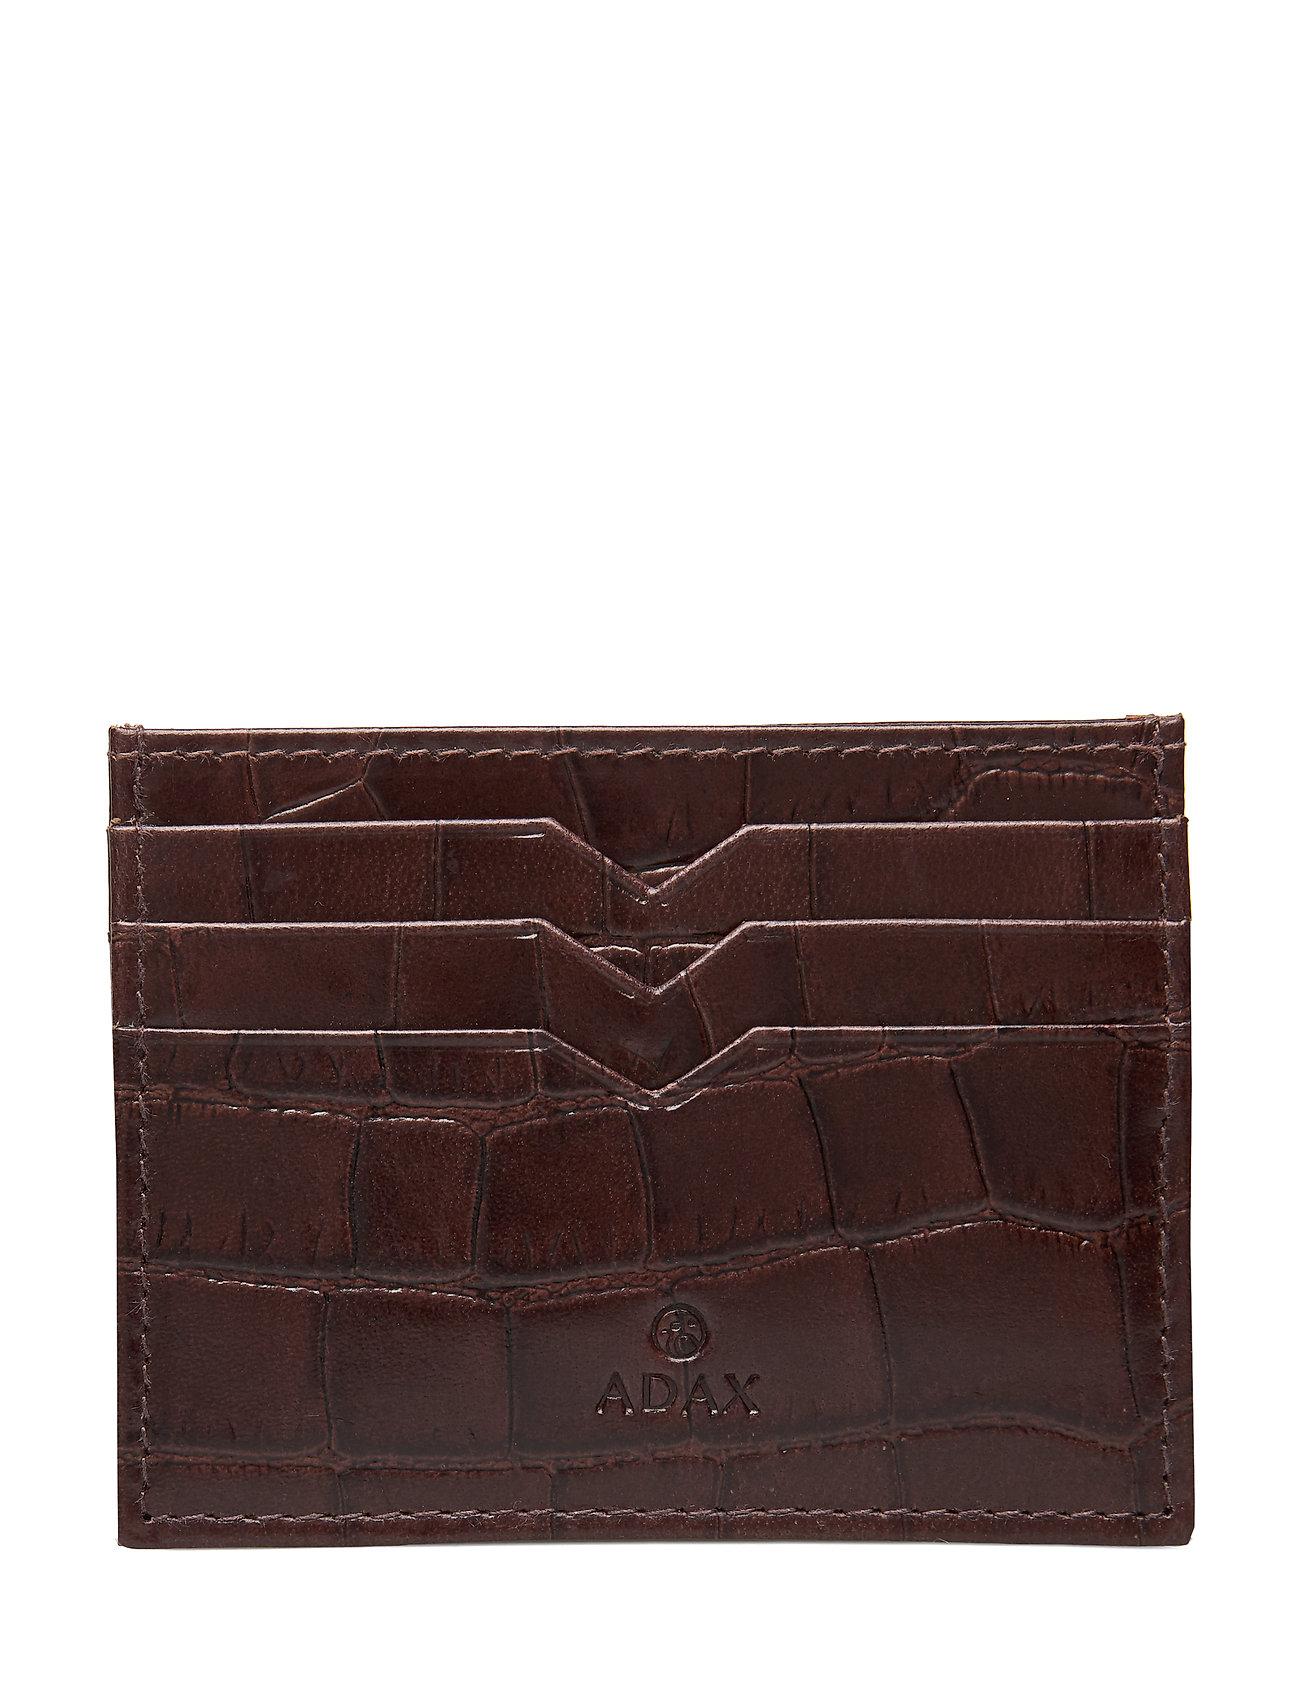 Image of Piemonte Credit Card Holder Milo Bags Card Holders & Wallets Card Holder Brun Adax (3303361051)